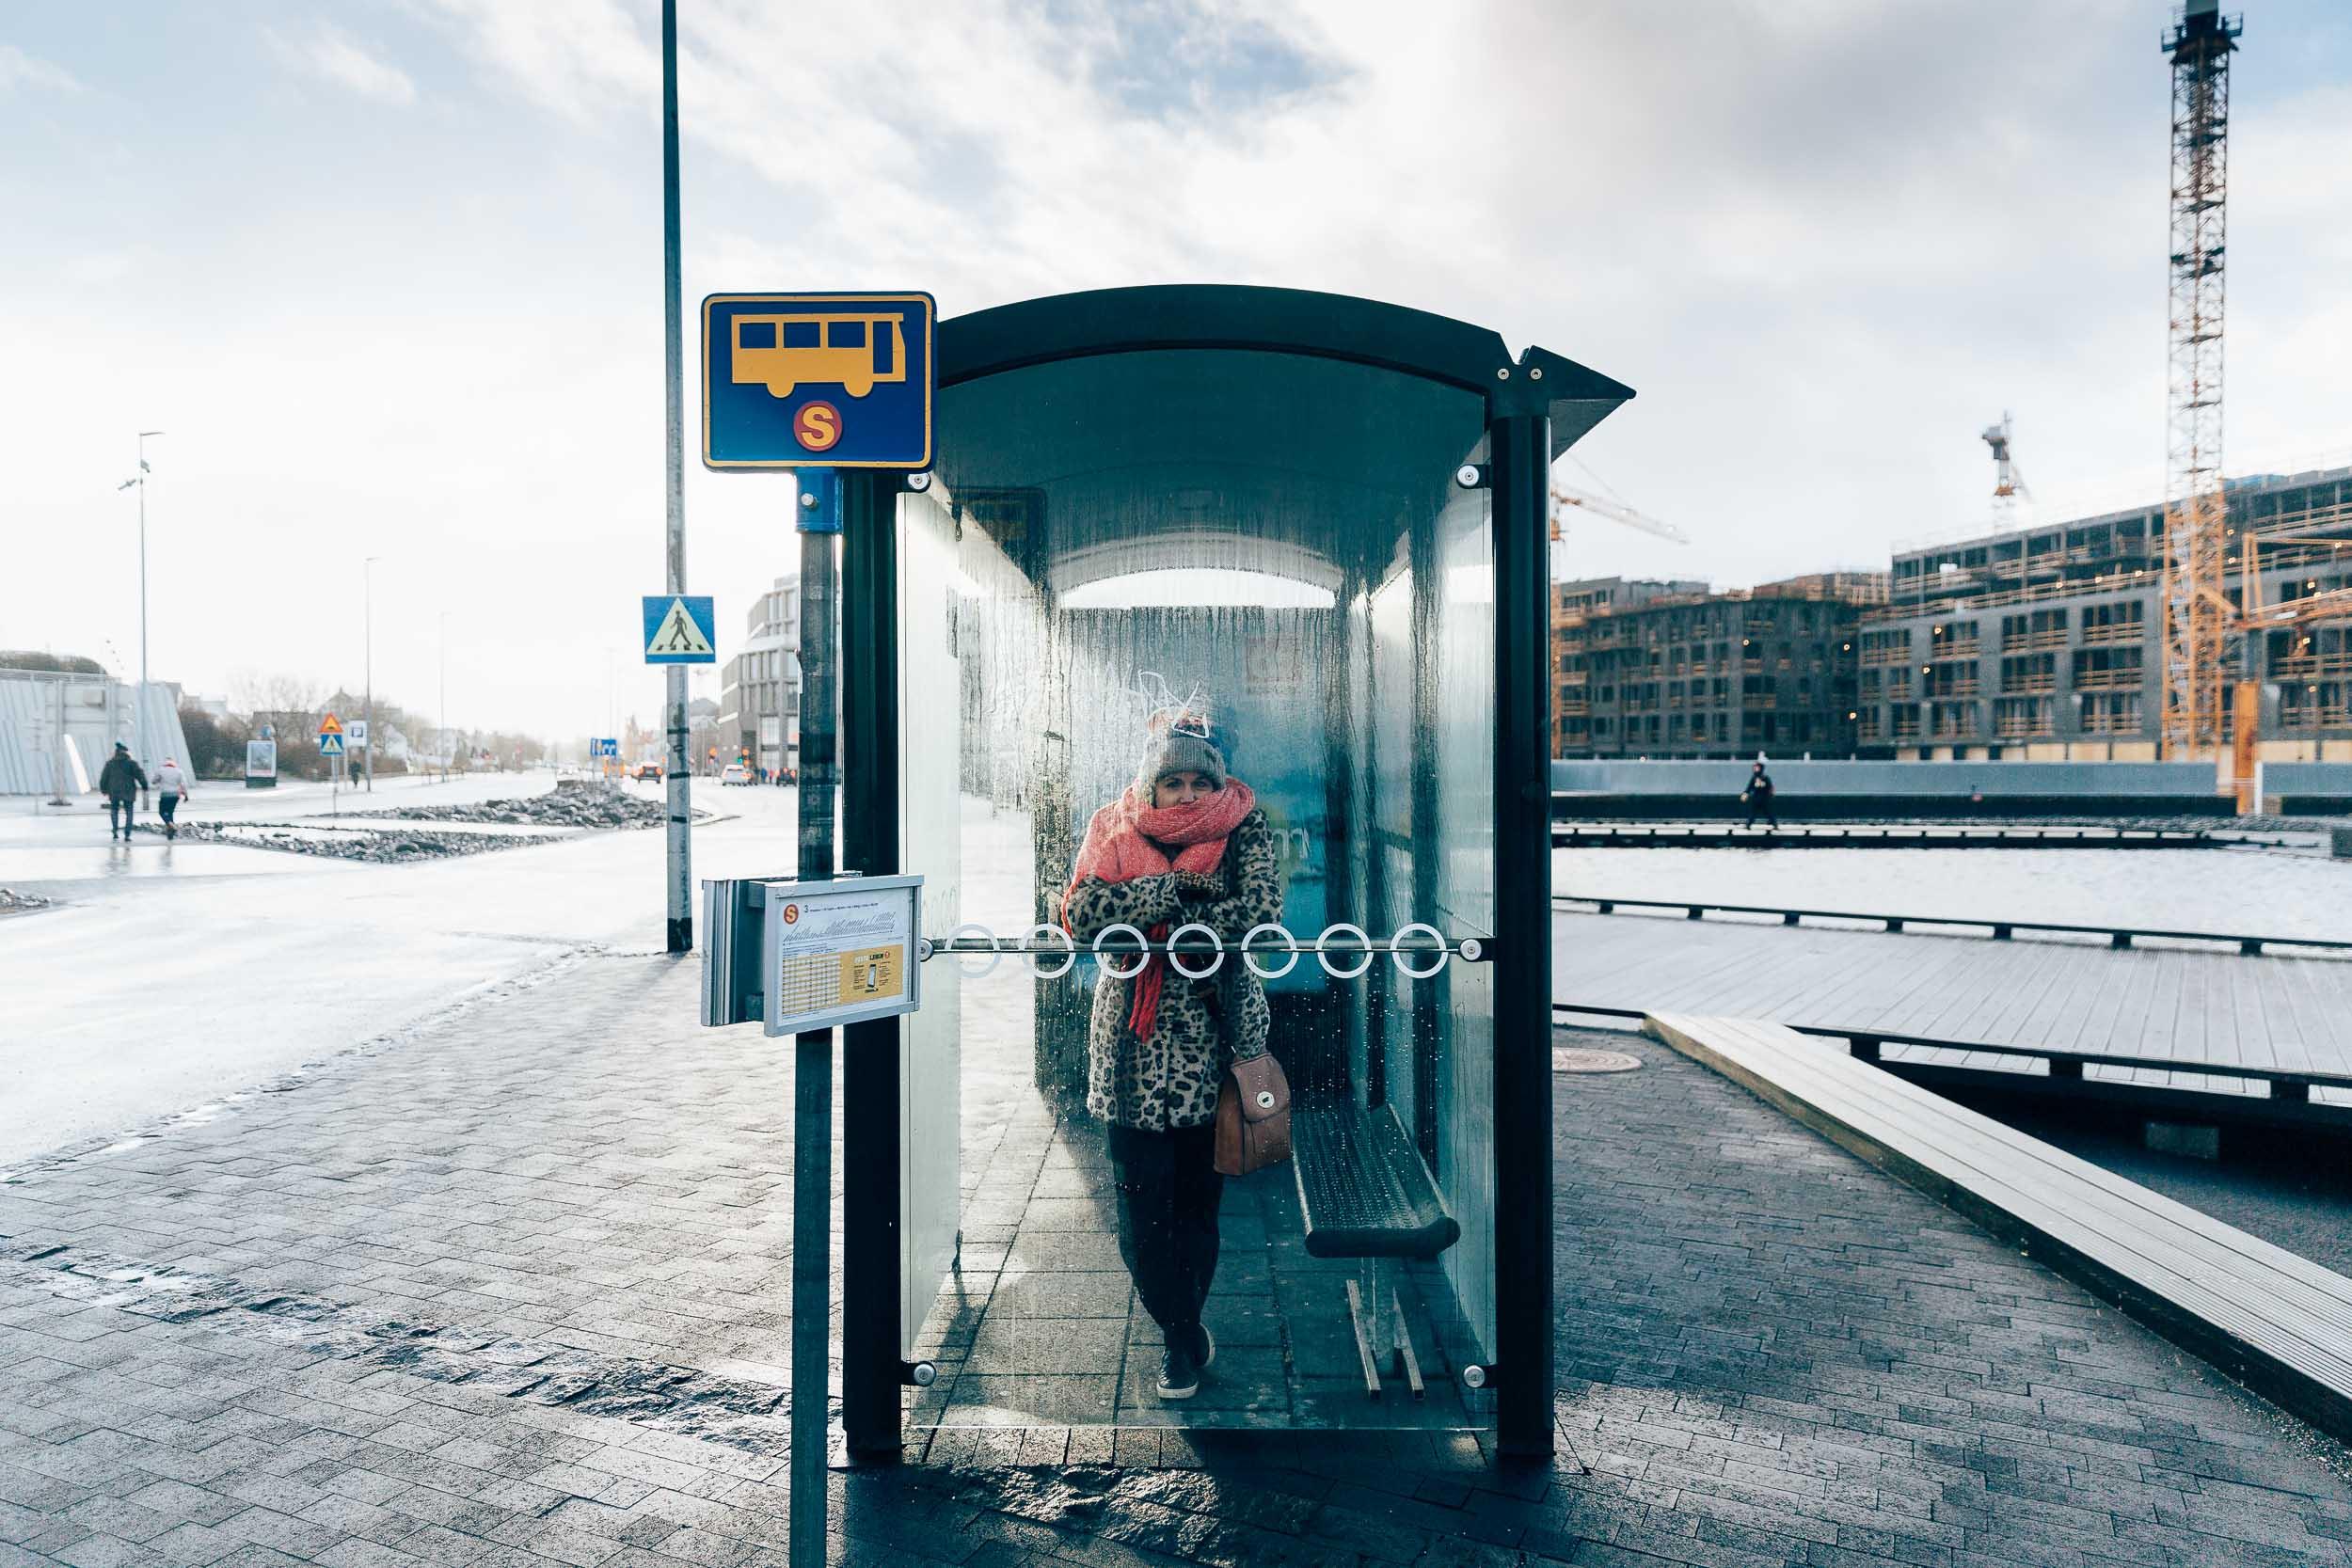 02_2019_Iceland-233.jpg